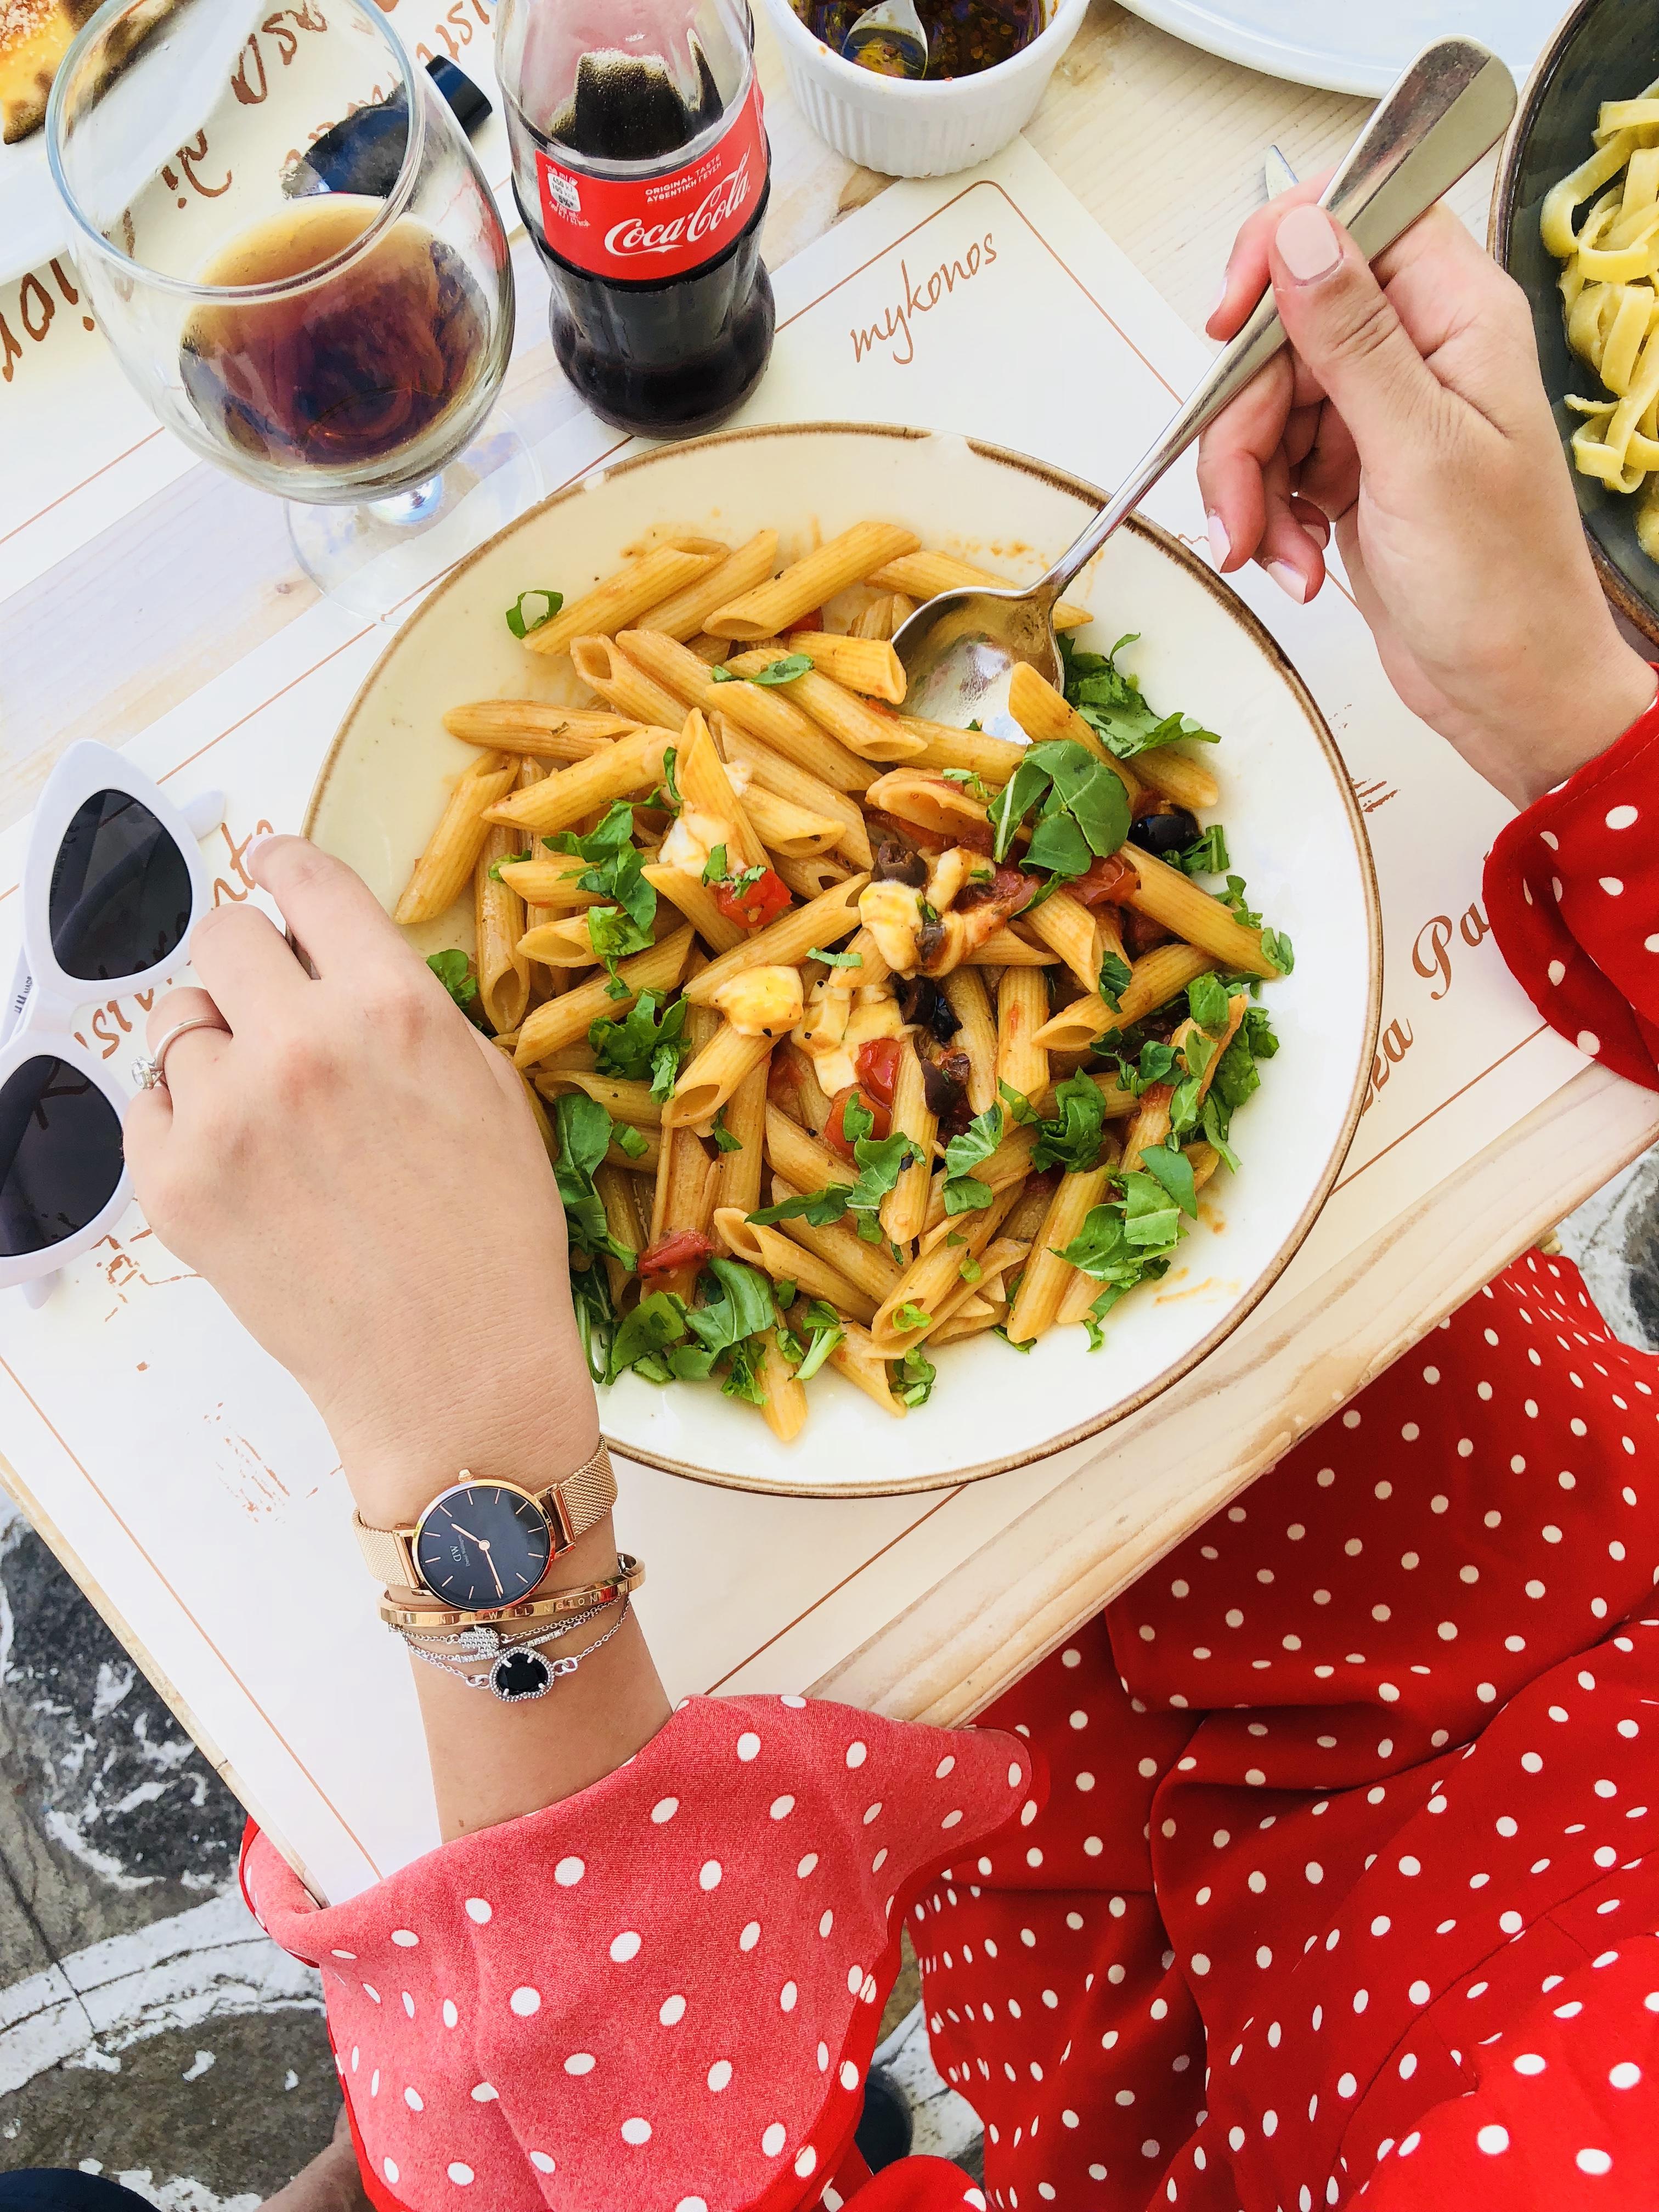 casa-di-giorgio-restaurant-italien-mykonos-lifestyle